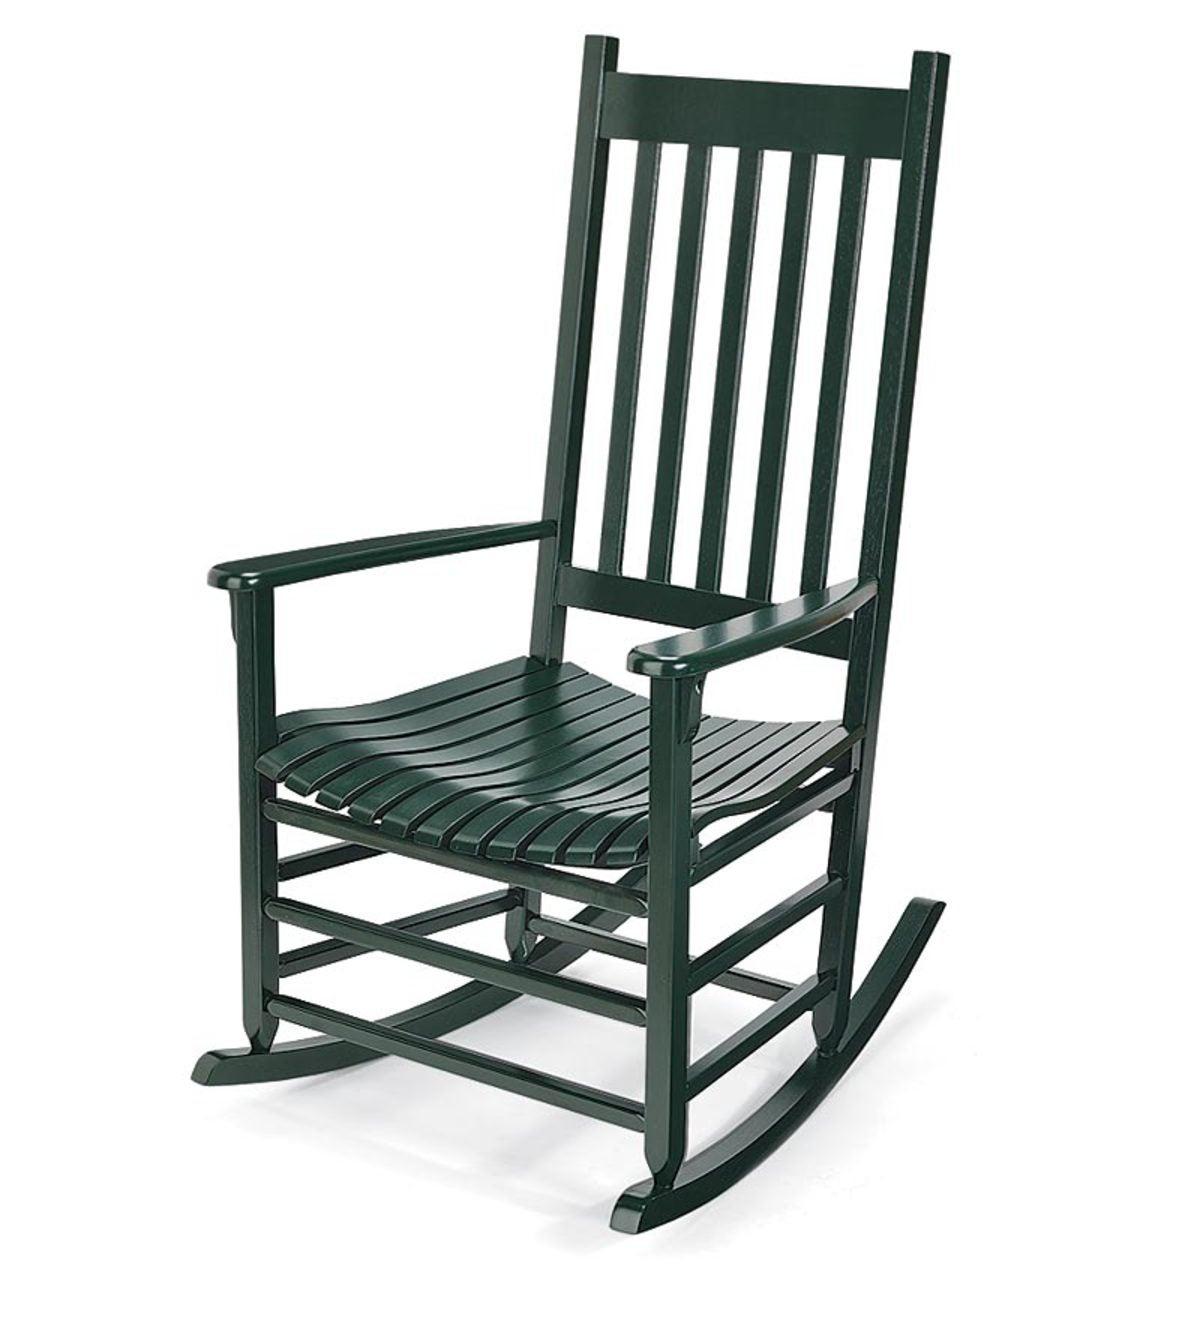 Pleasant Classic Slatted Low Maintenance Eucalyptus Rocker Green Cjindustries Chair Design For Home Cjindustriesco